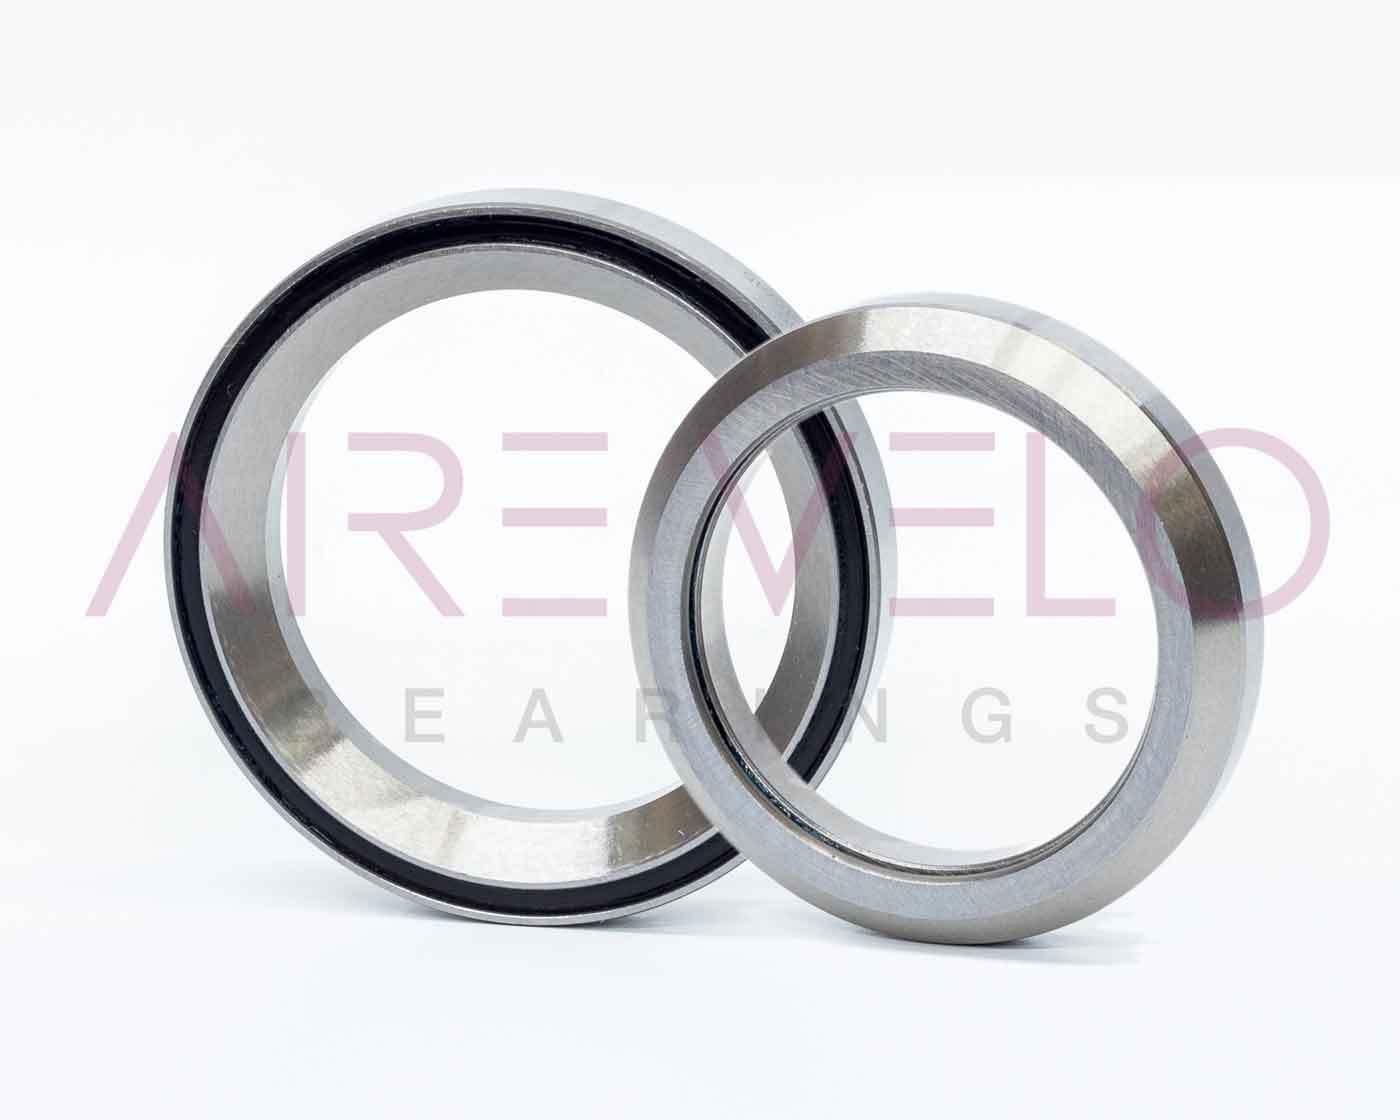 Cannondale Supersix Hybride Céramique Headset Headset Céramique bearings 15af21